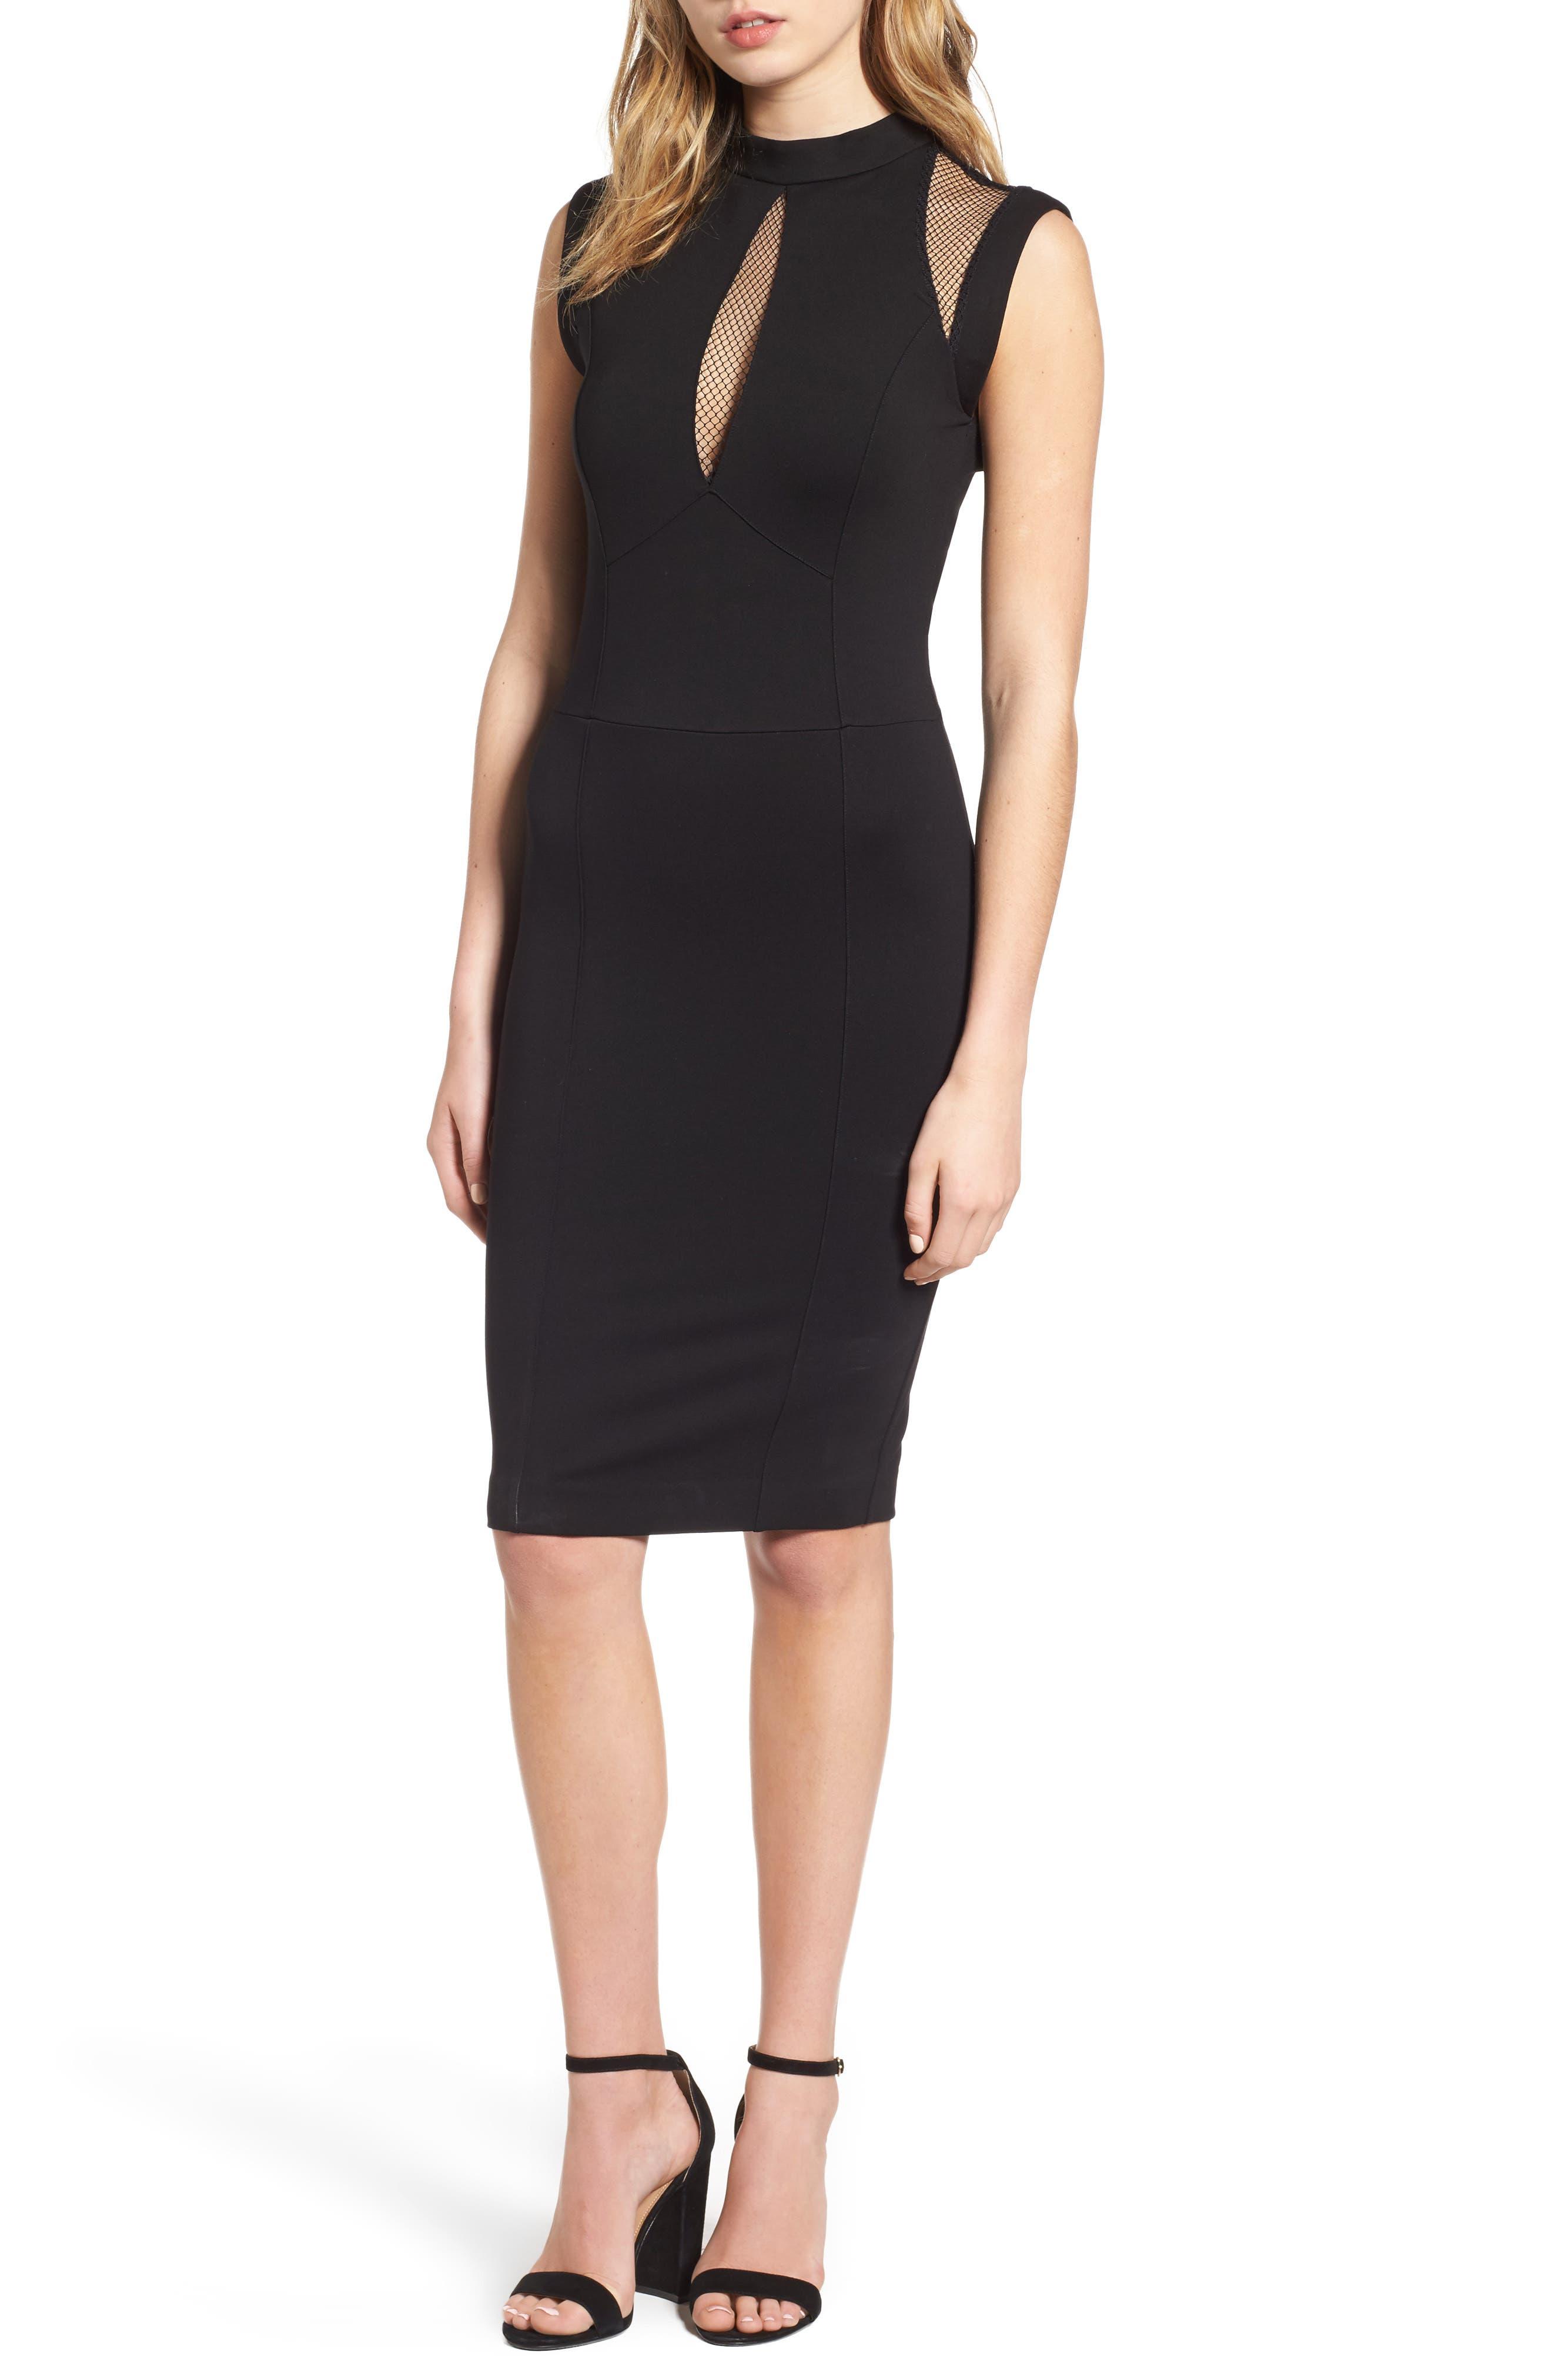 Sentimental NY Galactica Body-Con Dress